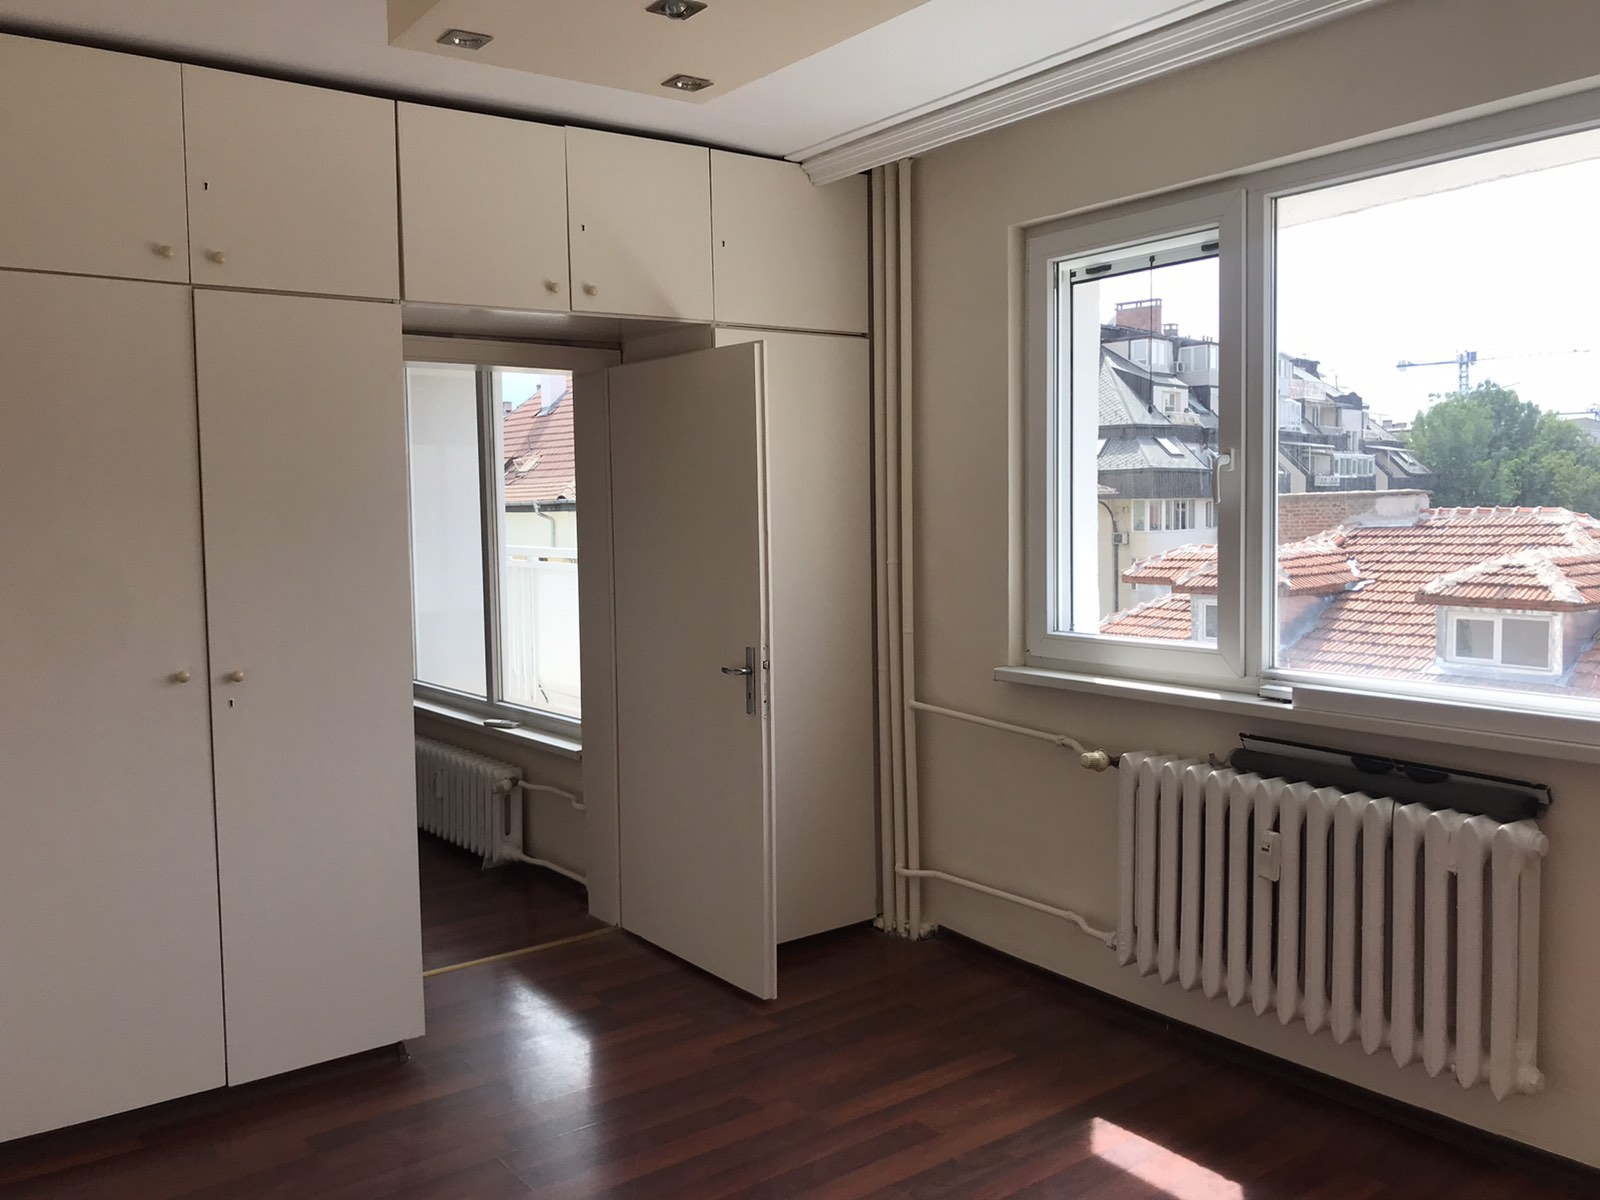 Тристаен апартамент под наем, кв. Изток, град София